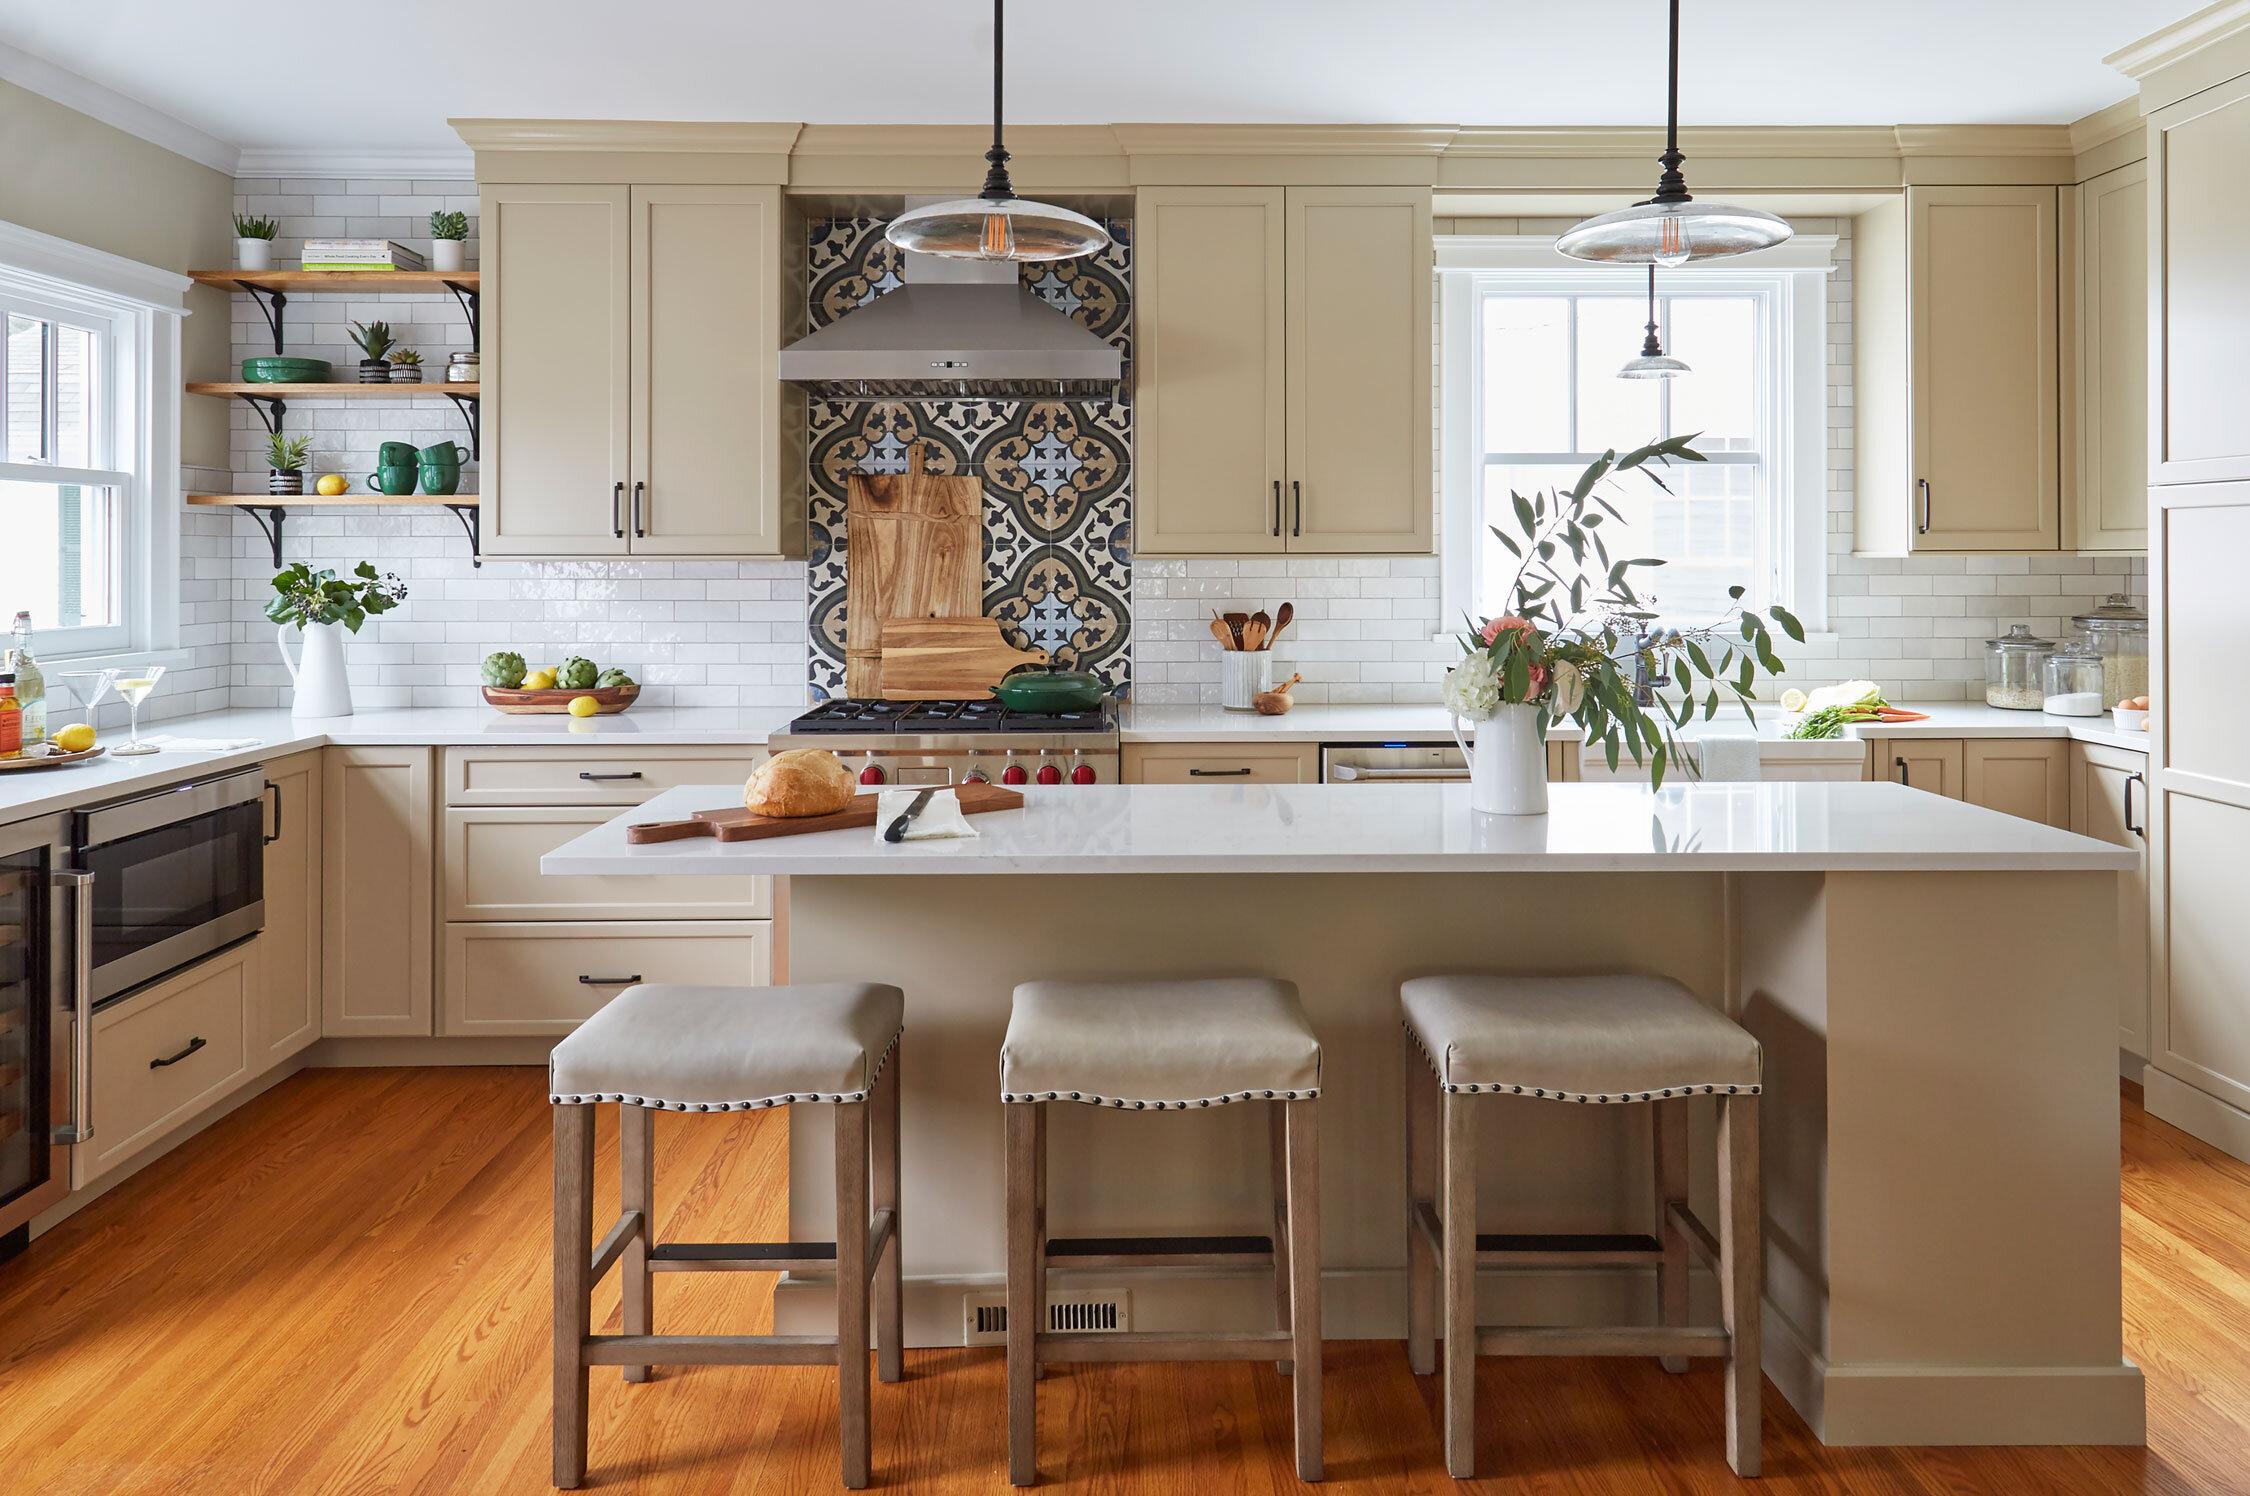 Design Build Vintage Kitchen Remodel The Kitchen Studio